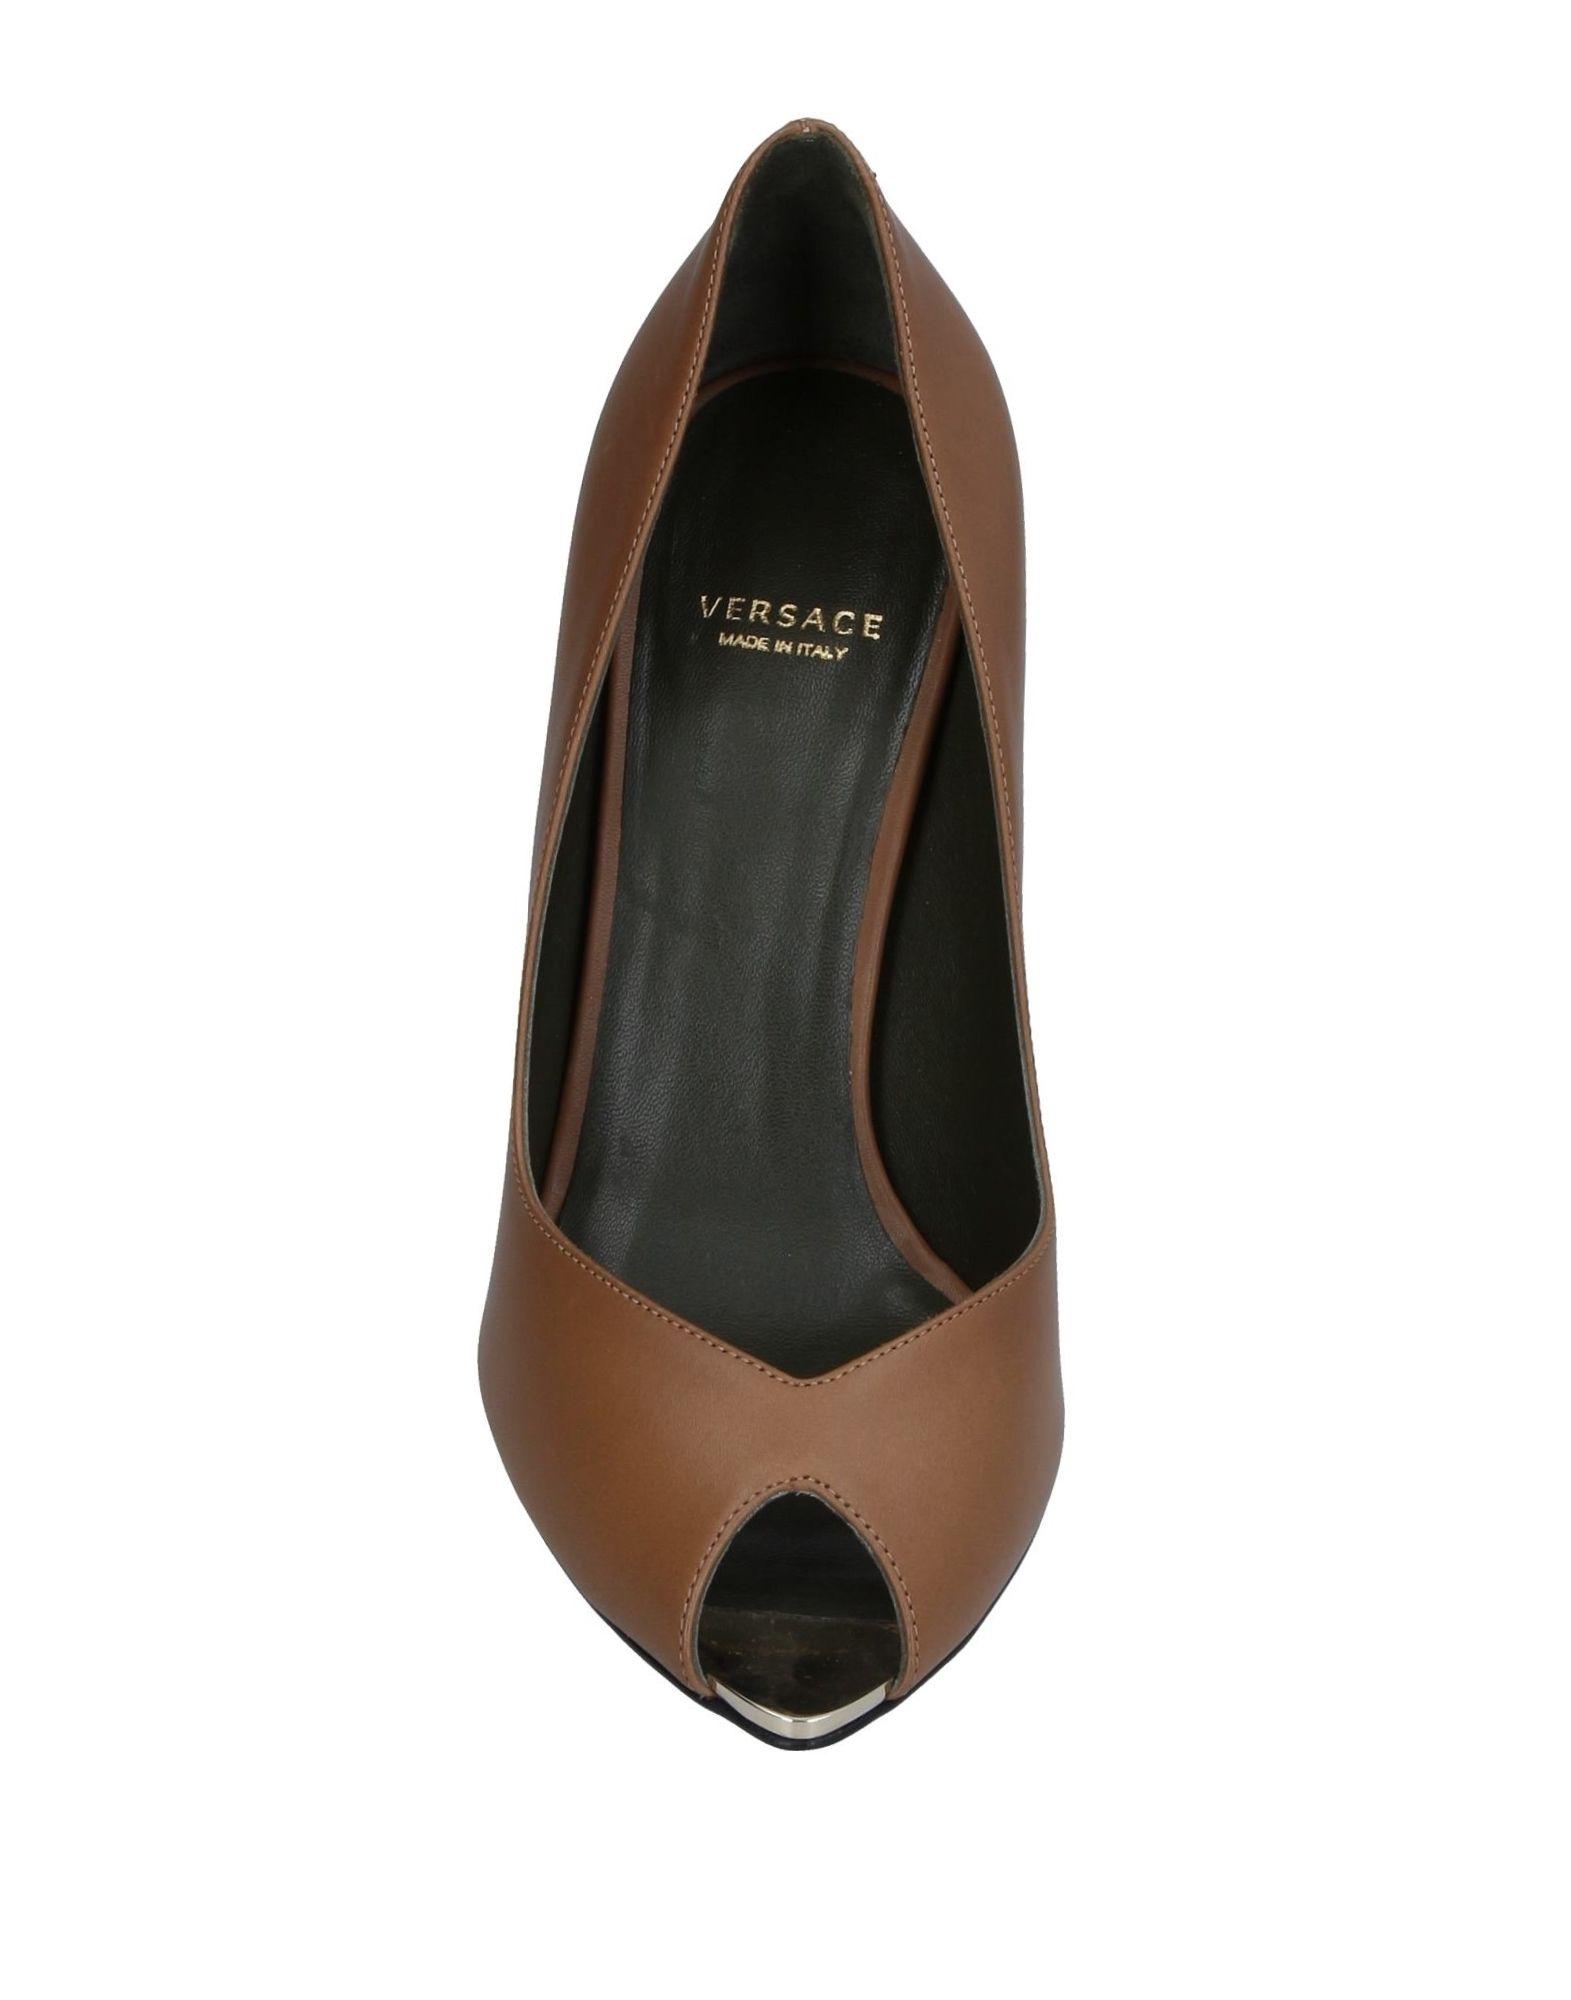 Haltbare Mode billige Schuhe Versace Pumps Damen  11370543ML Heiße Schuhe